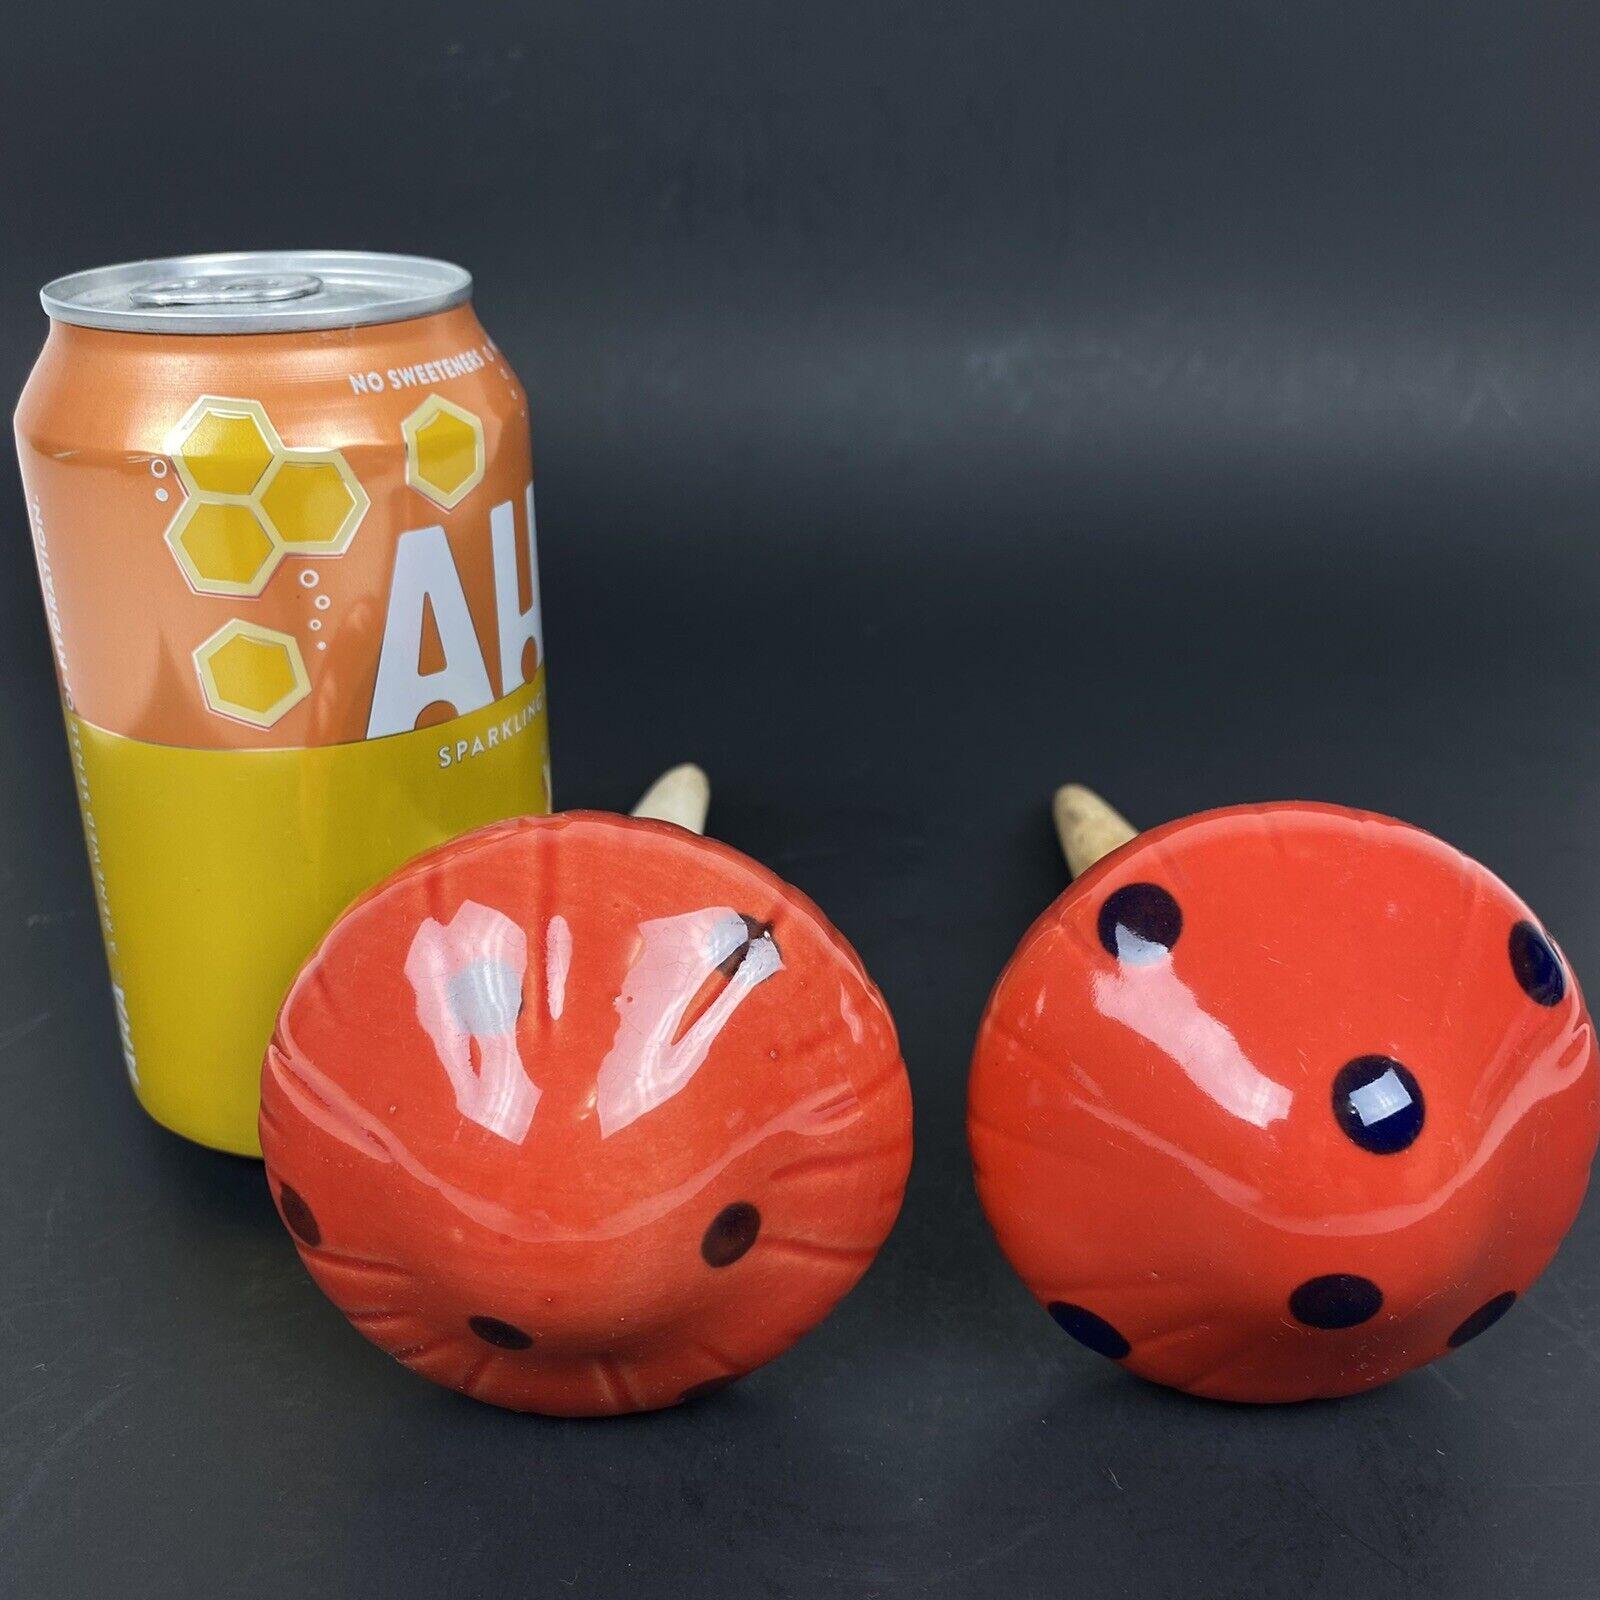 Set of 2 Ceramic Glazed Red Polka Dot Mushroom Plant Water Feeder Watering Spike